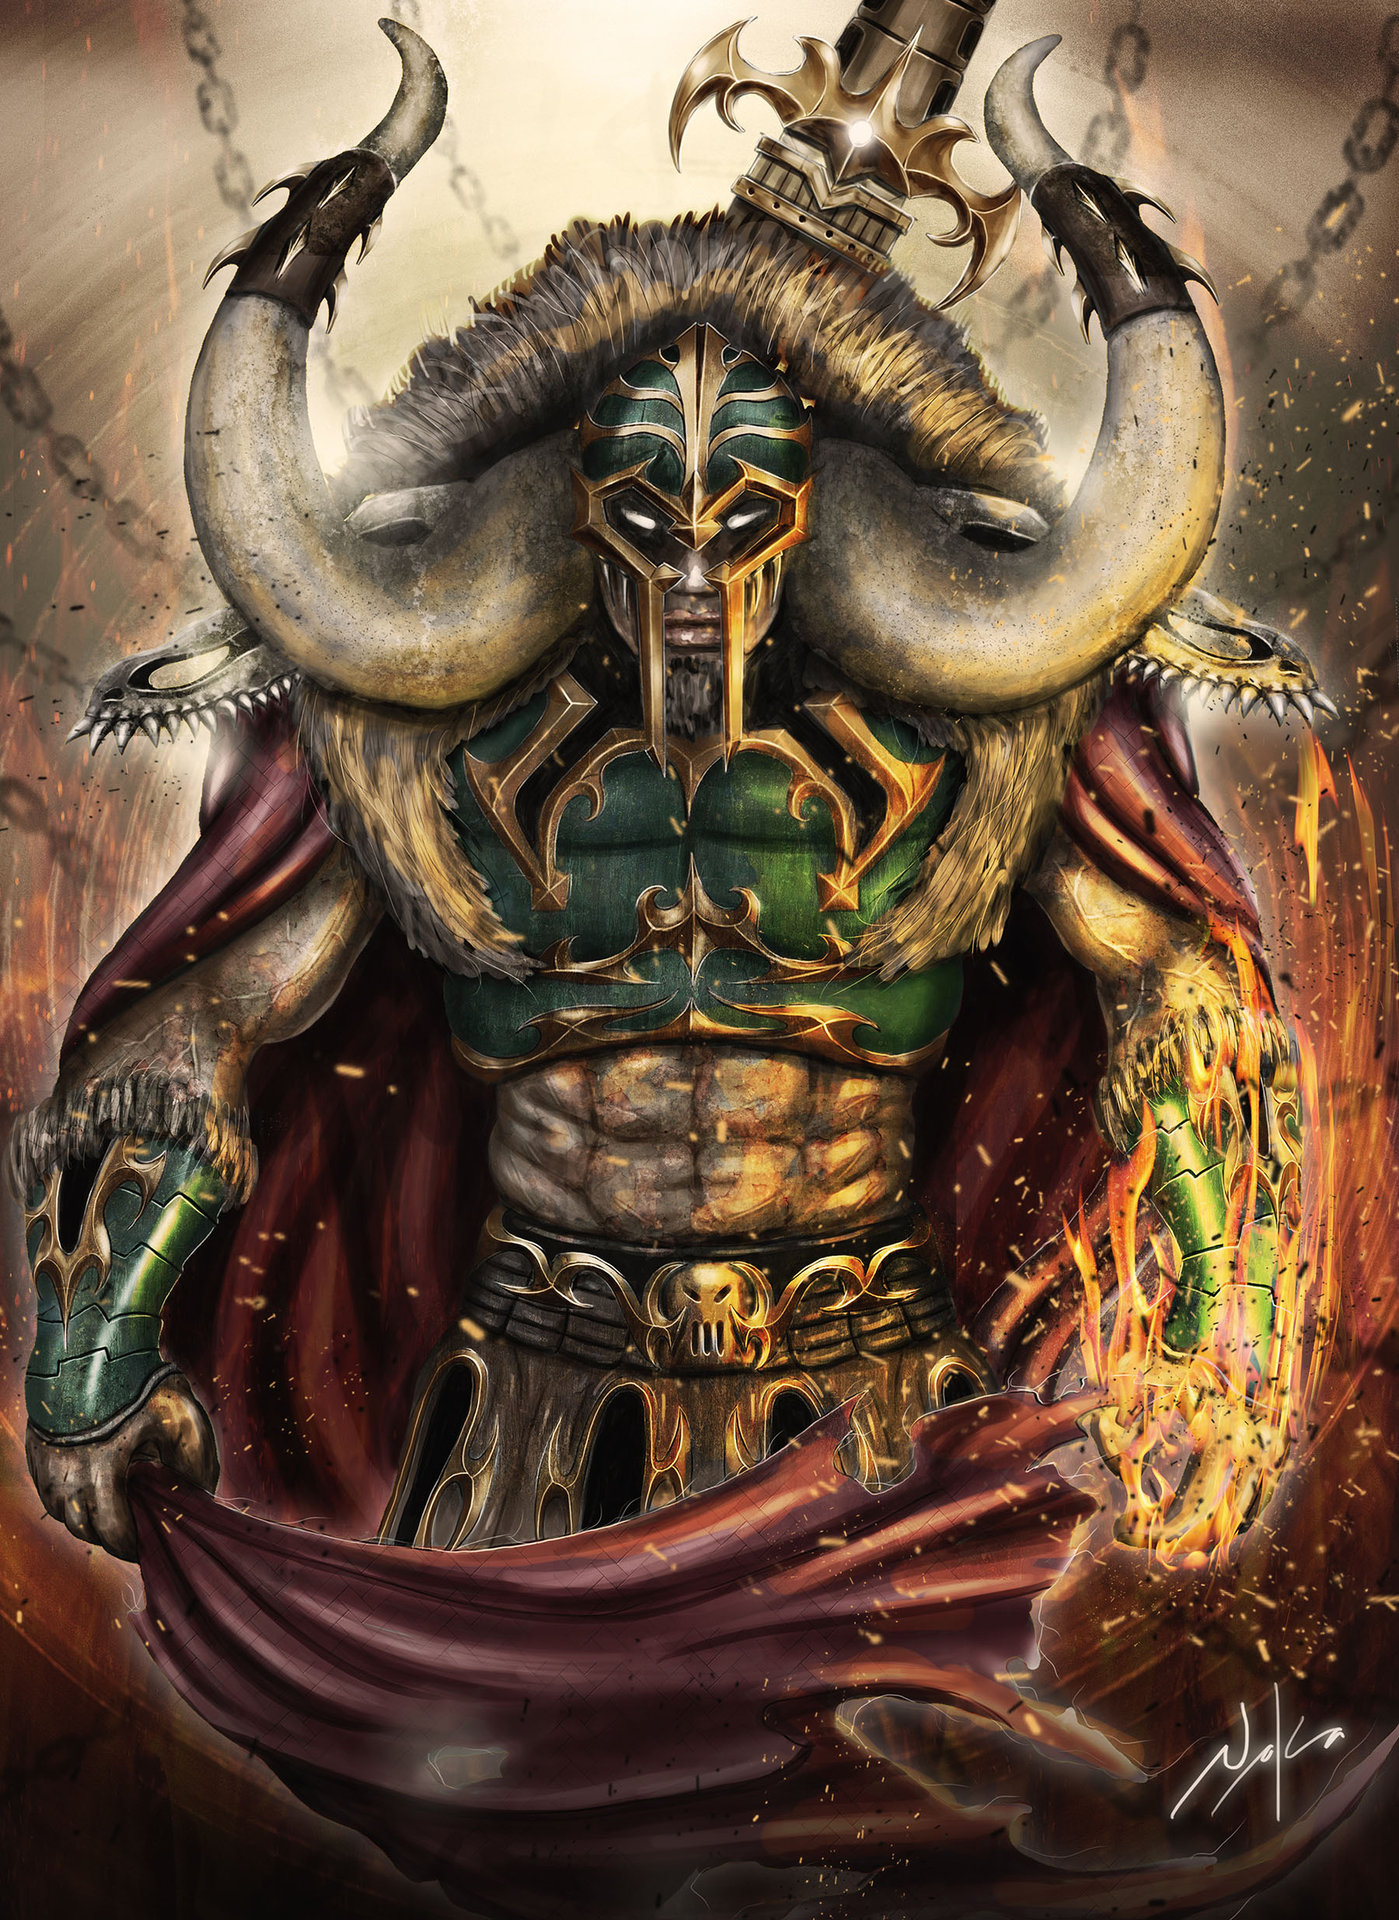 Emperor's flame